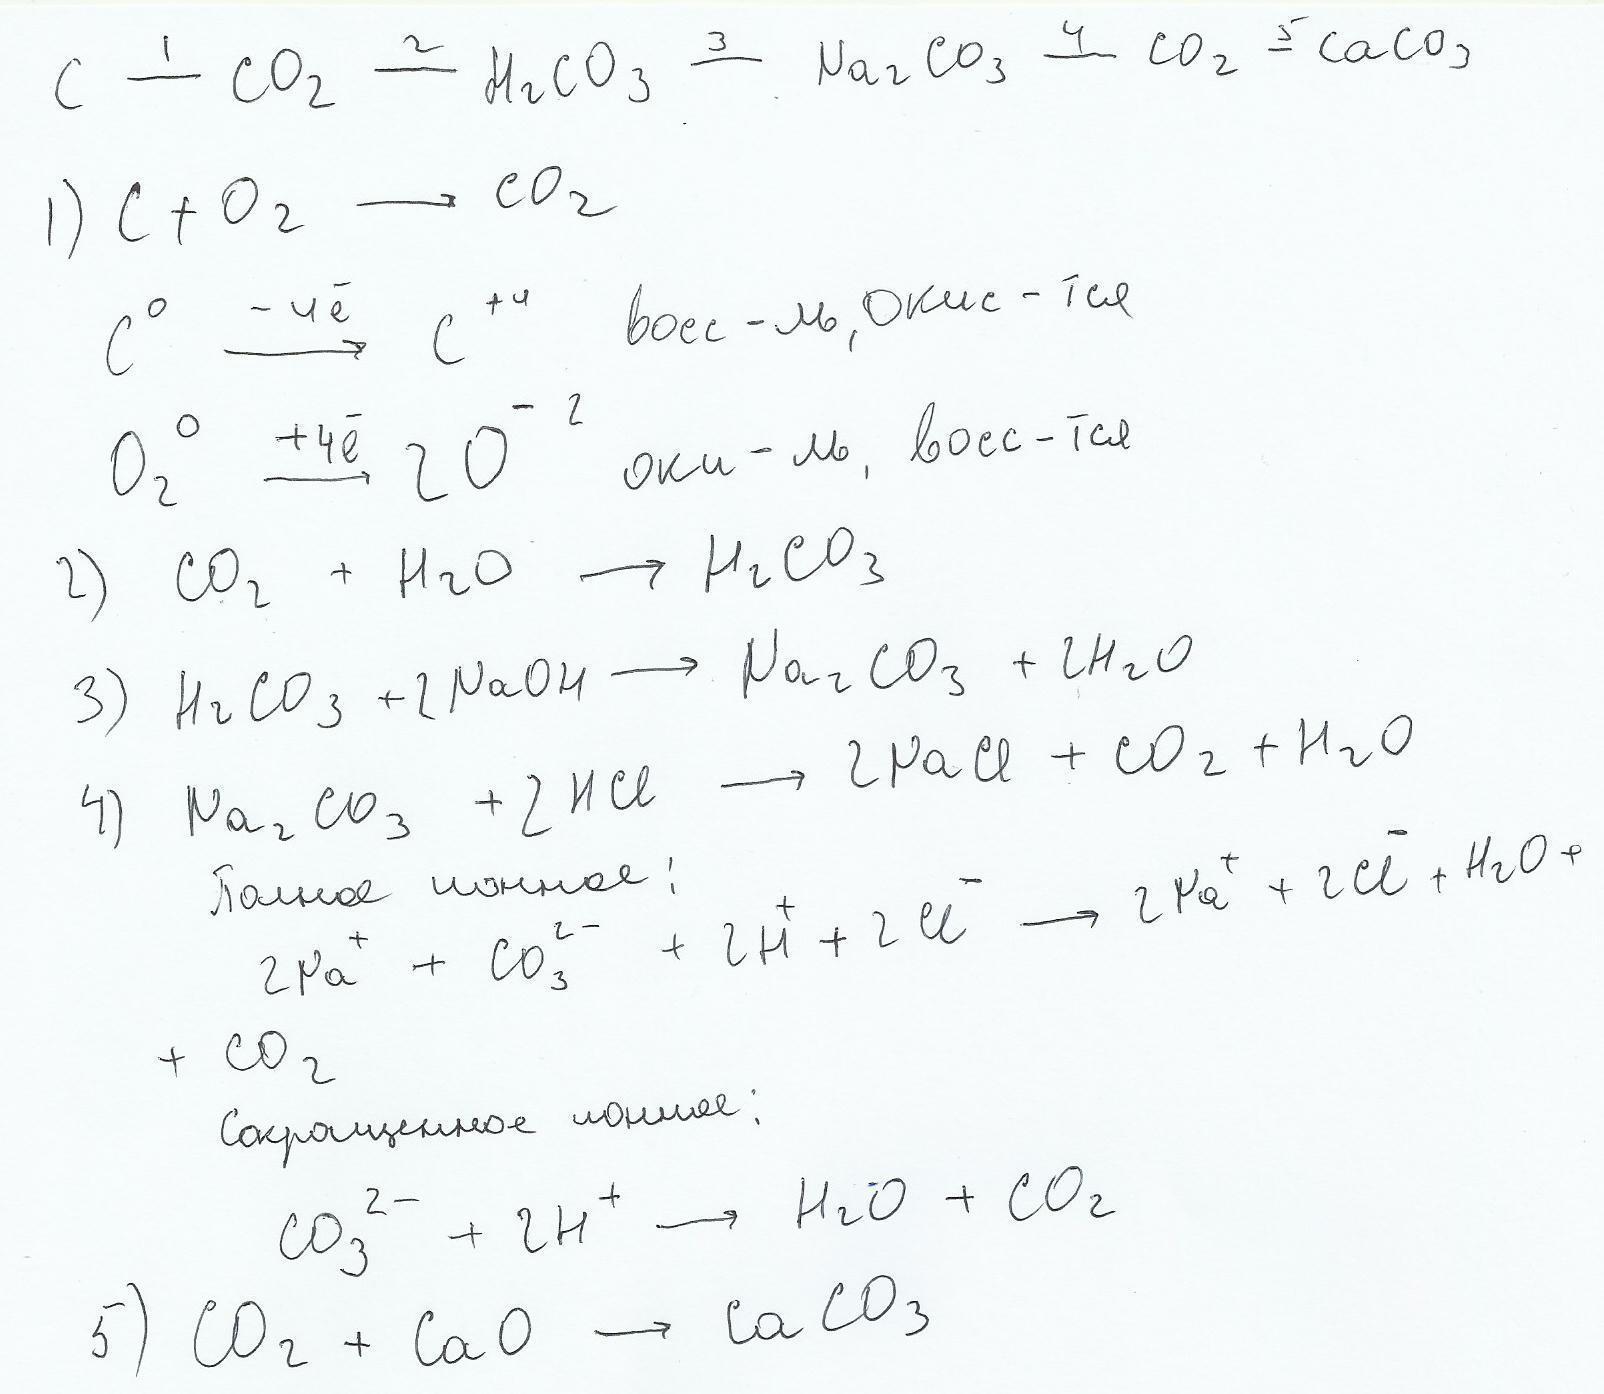 Дана схема превращений co co2 na2co3 baco3